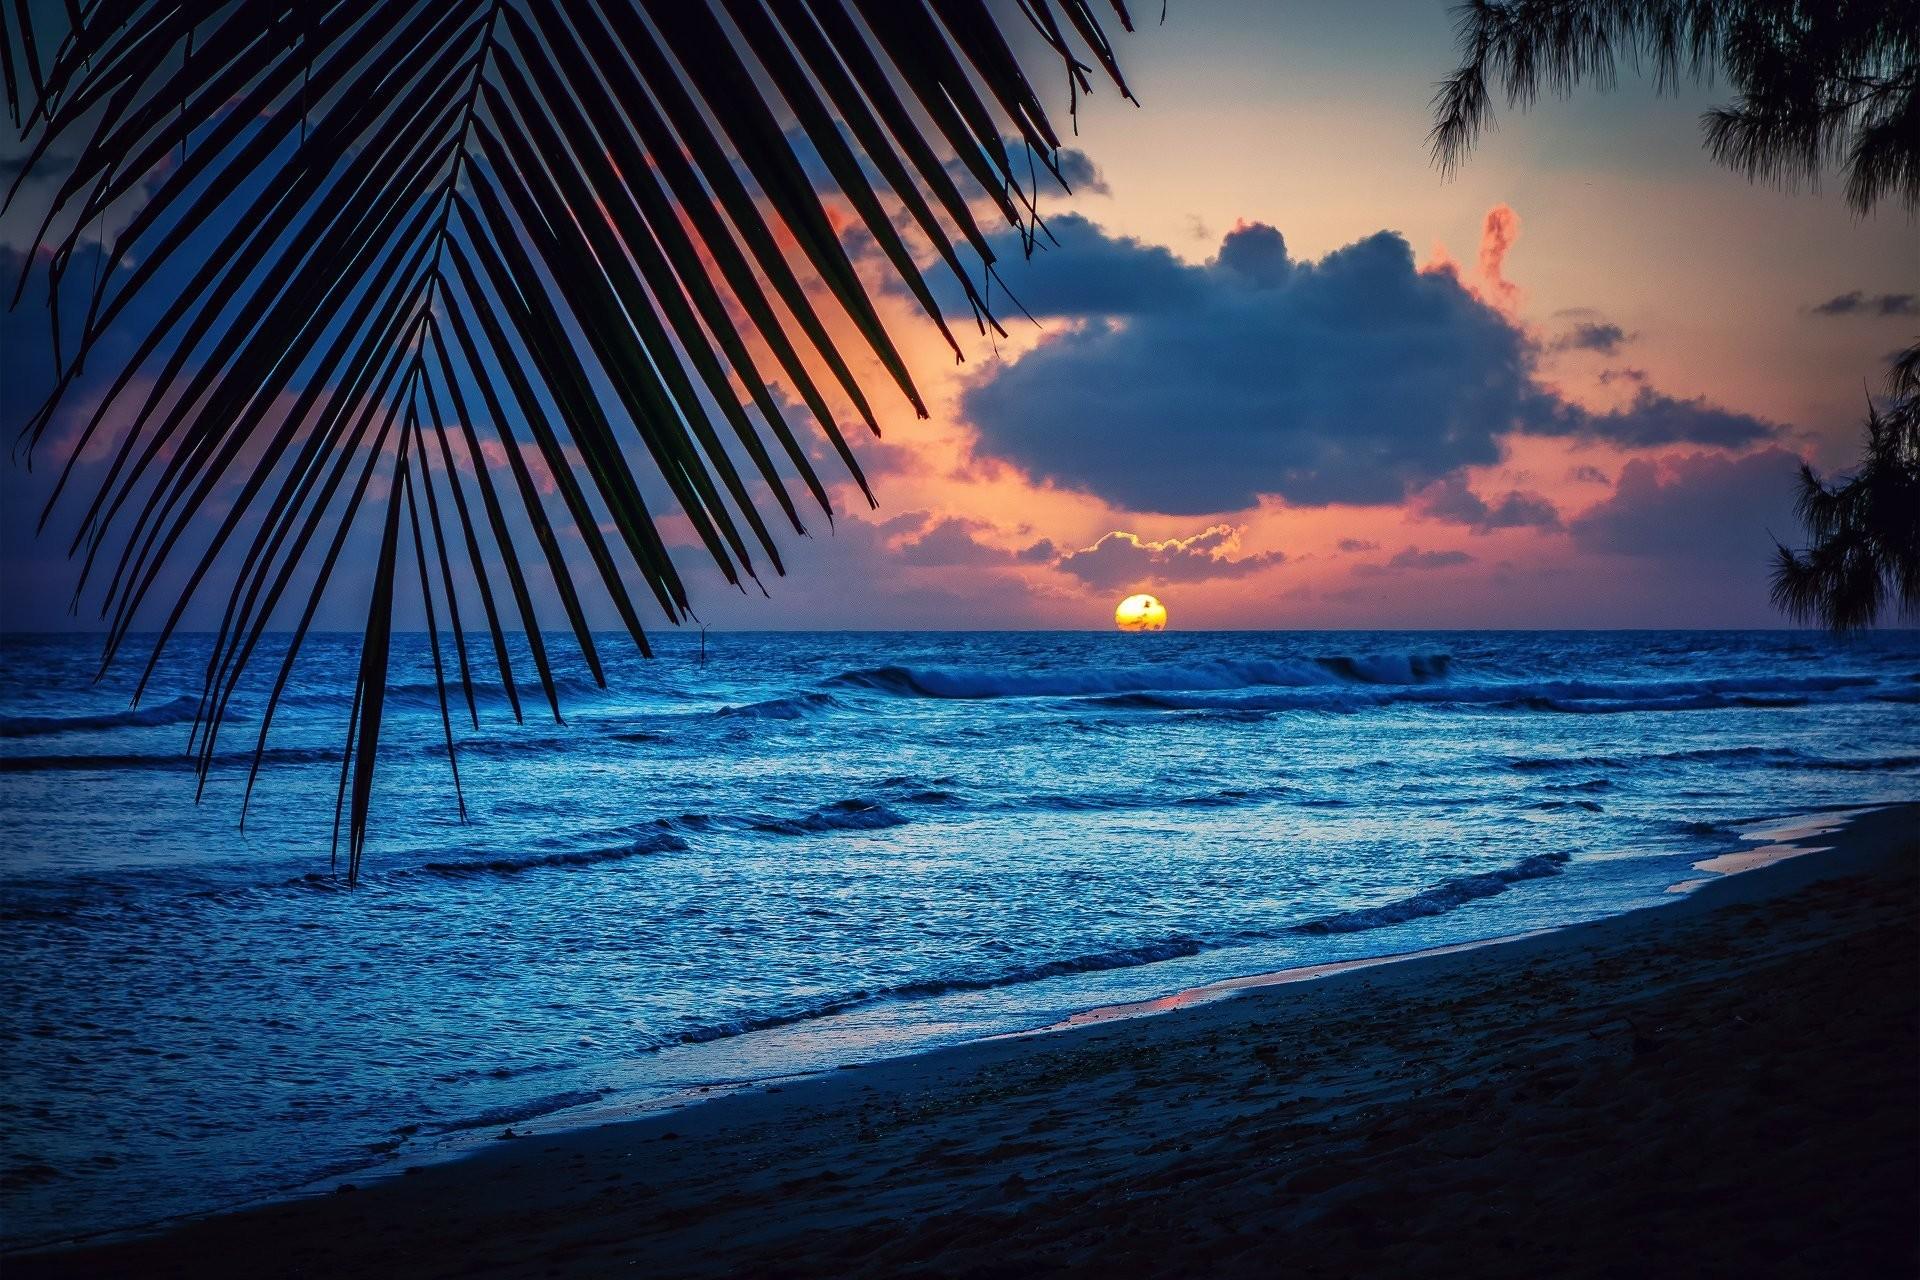 barbados caribbean night beach sunset sun palm sheet silhouette